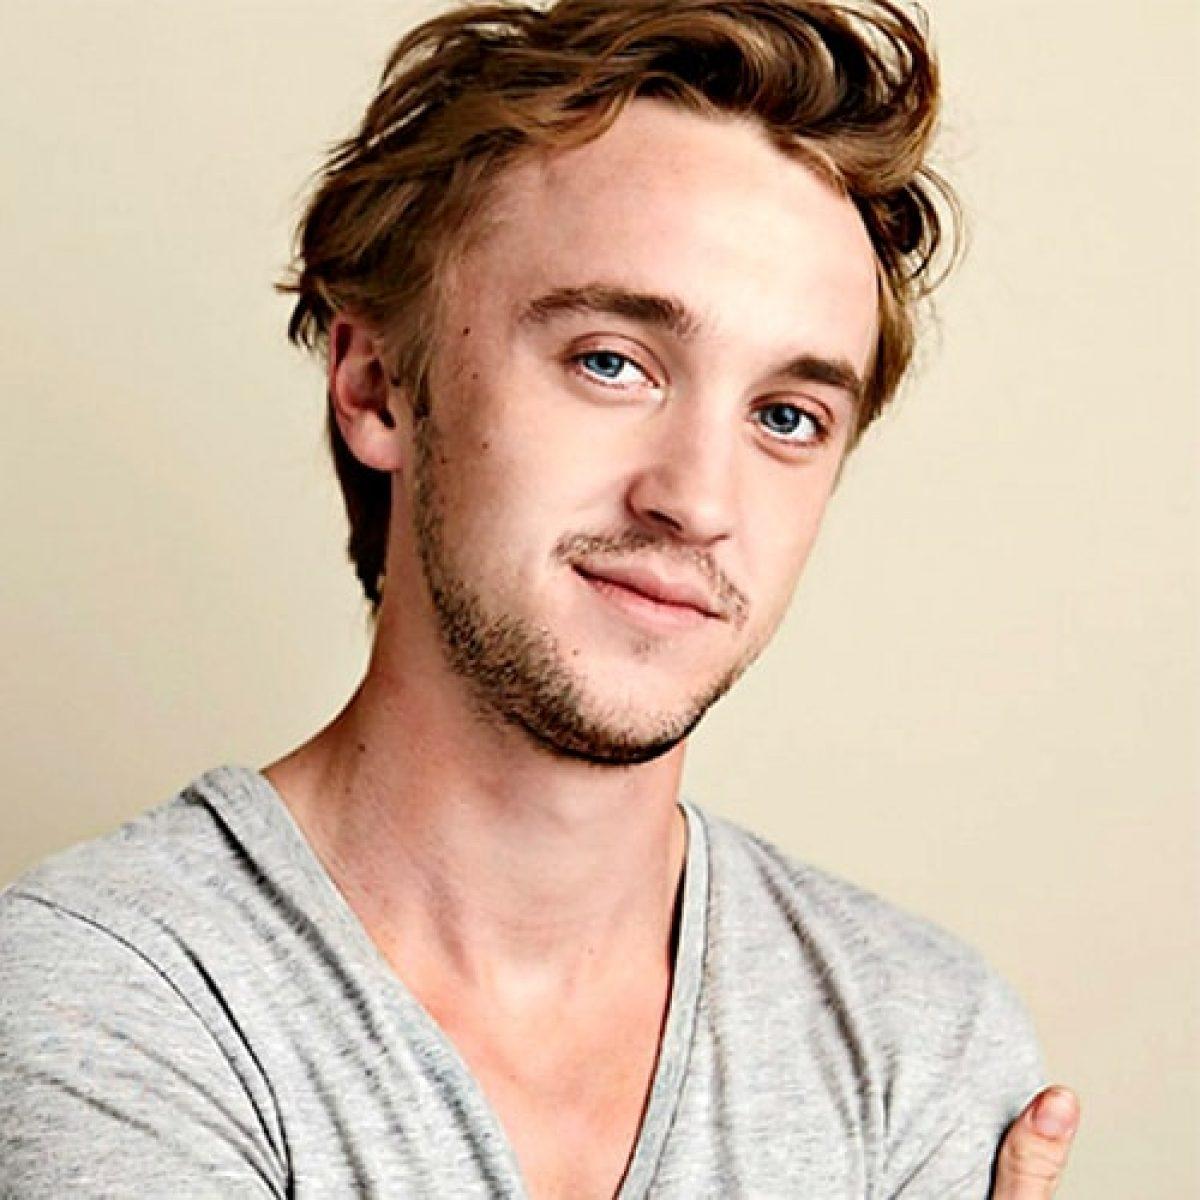 Felton single tom is Tom Felton